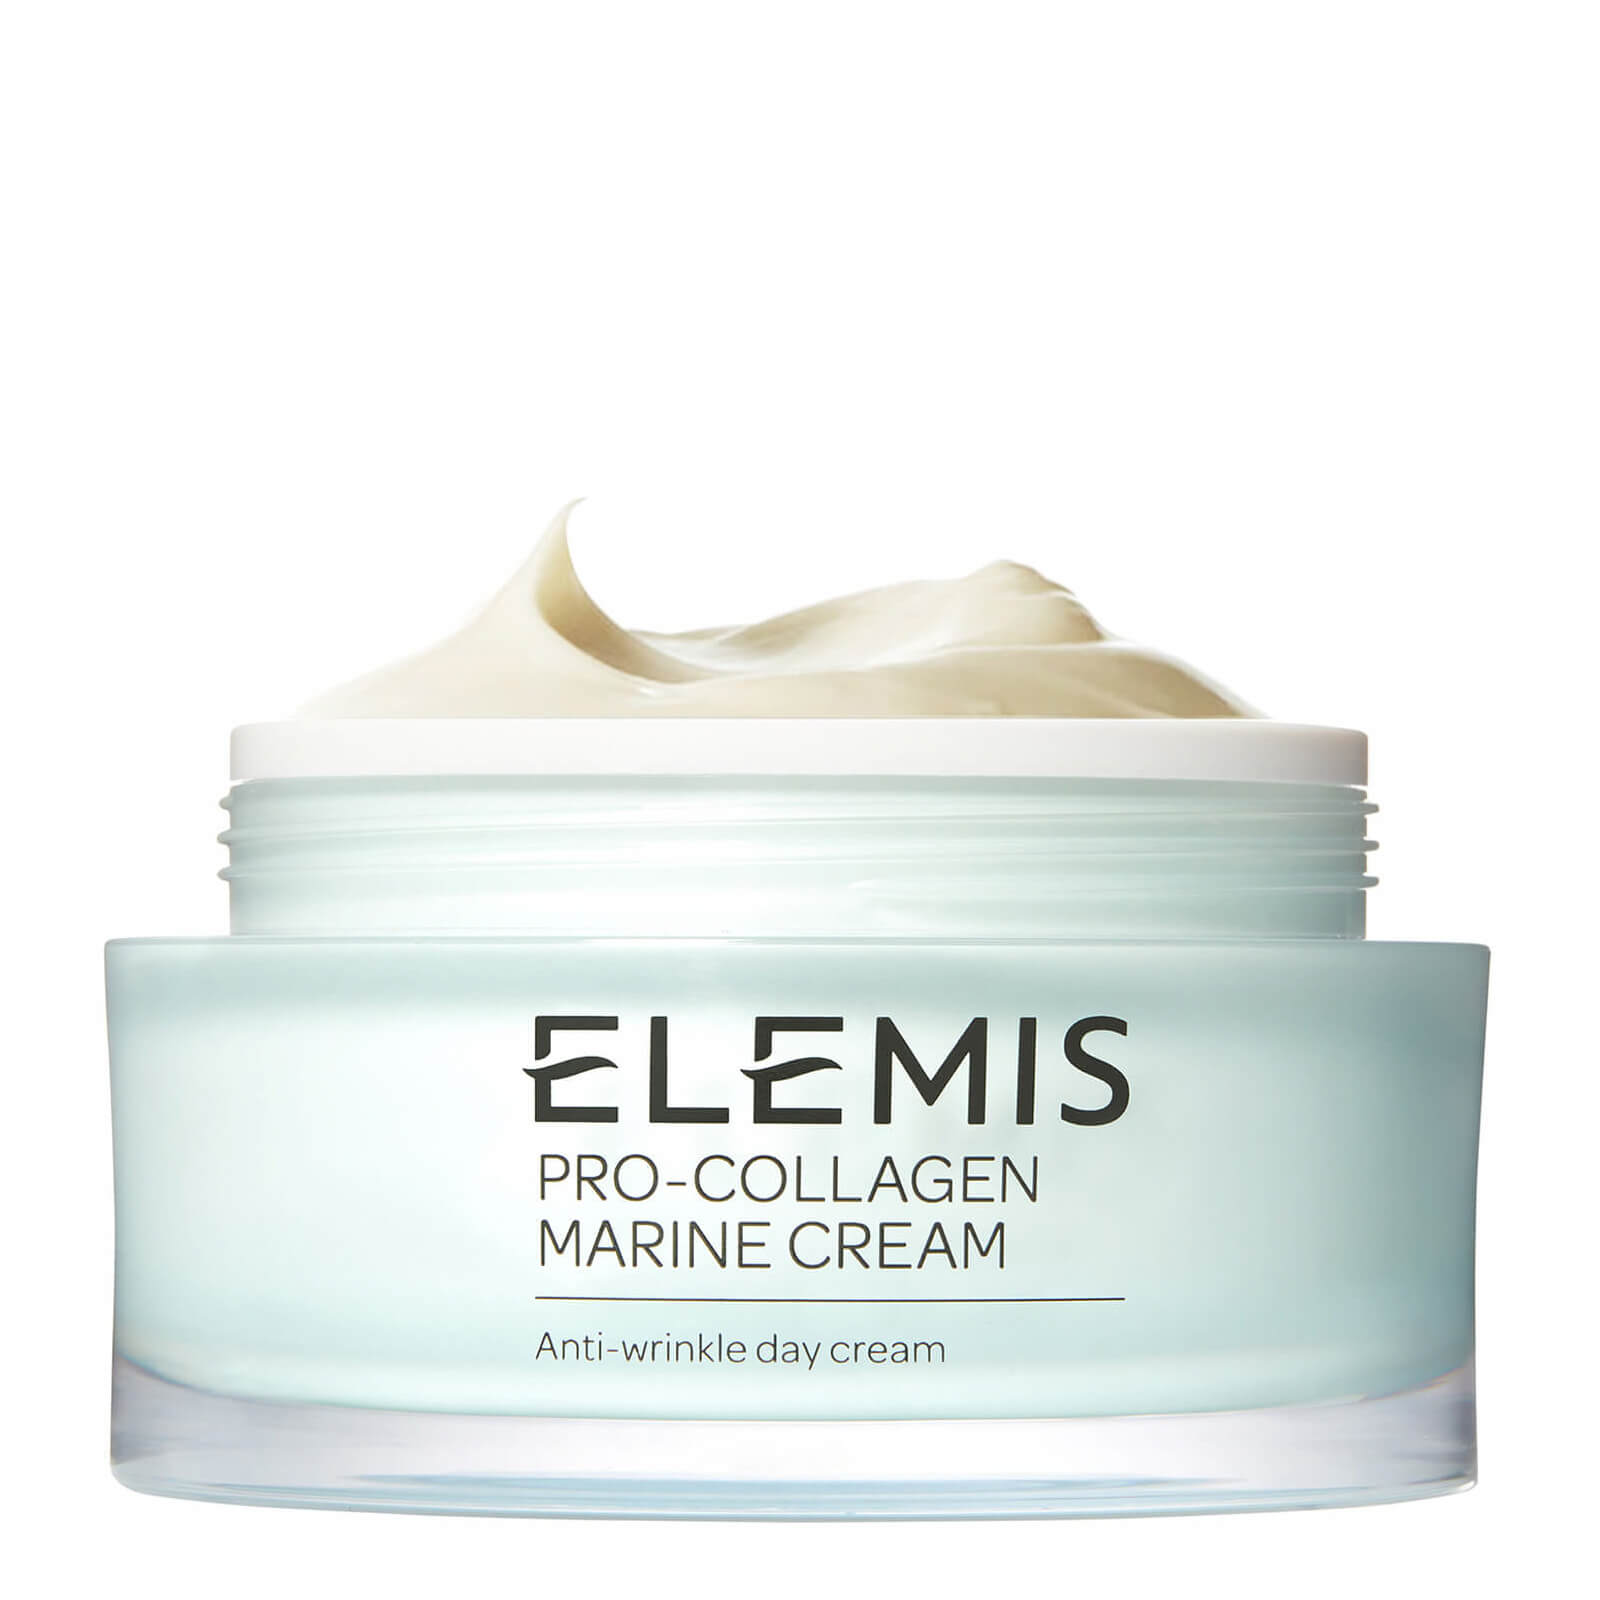 ELEMIS必買1.海洋膠原緊緻精華乳霜